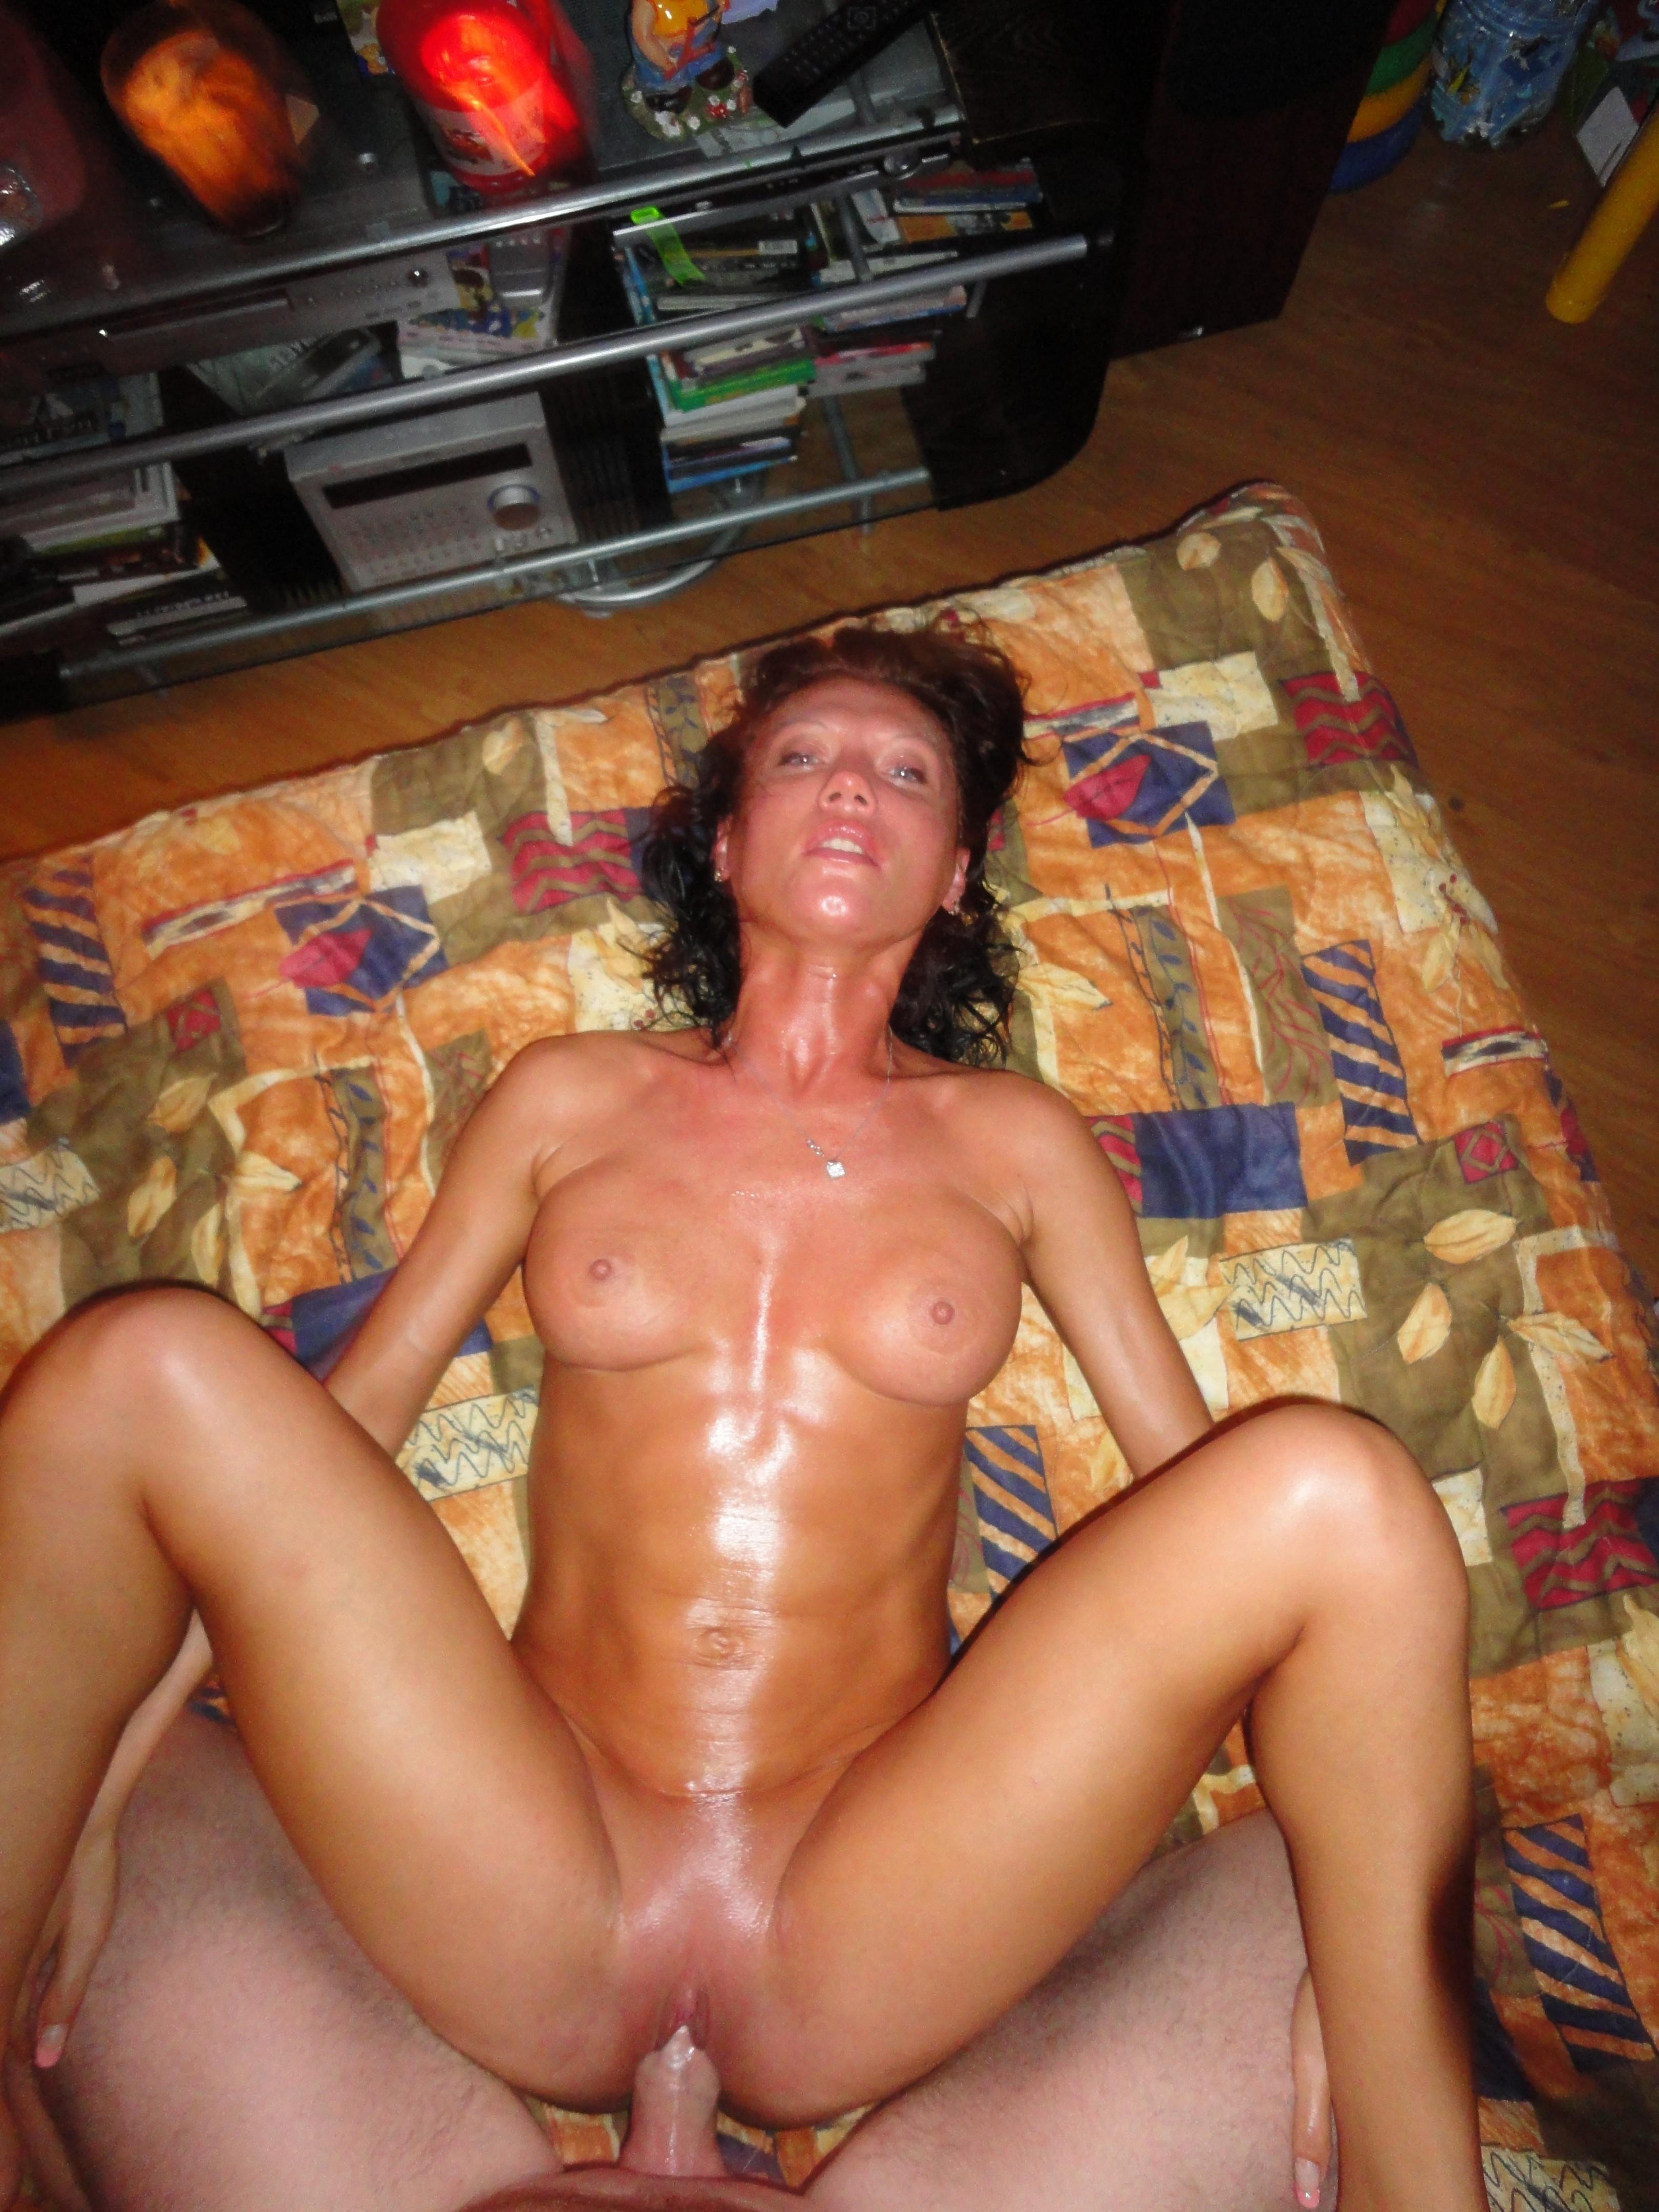 Просто фото домашнего секса - компиляция 29